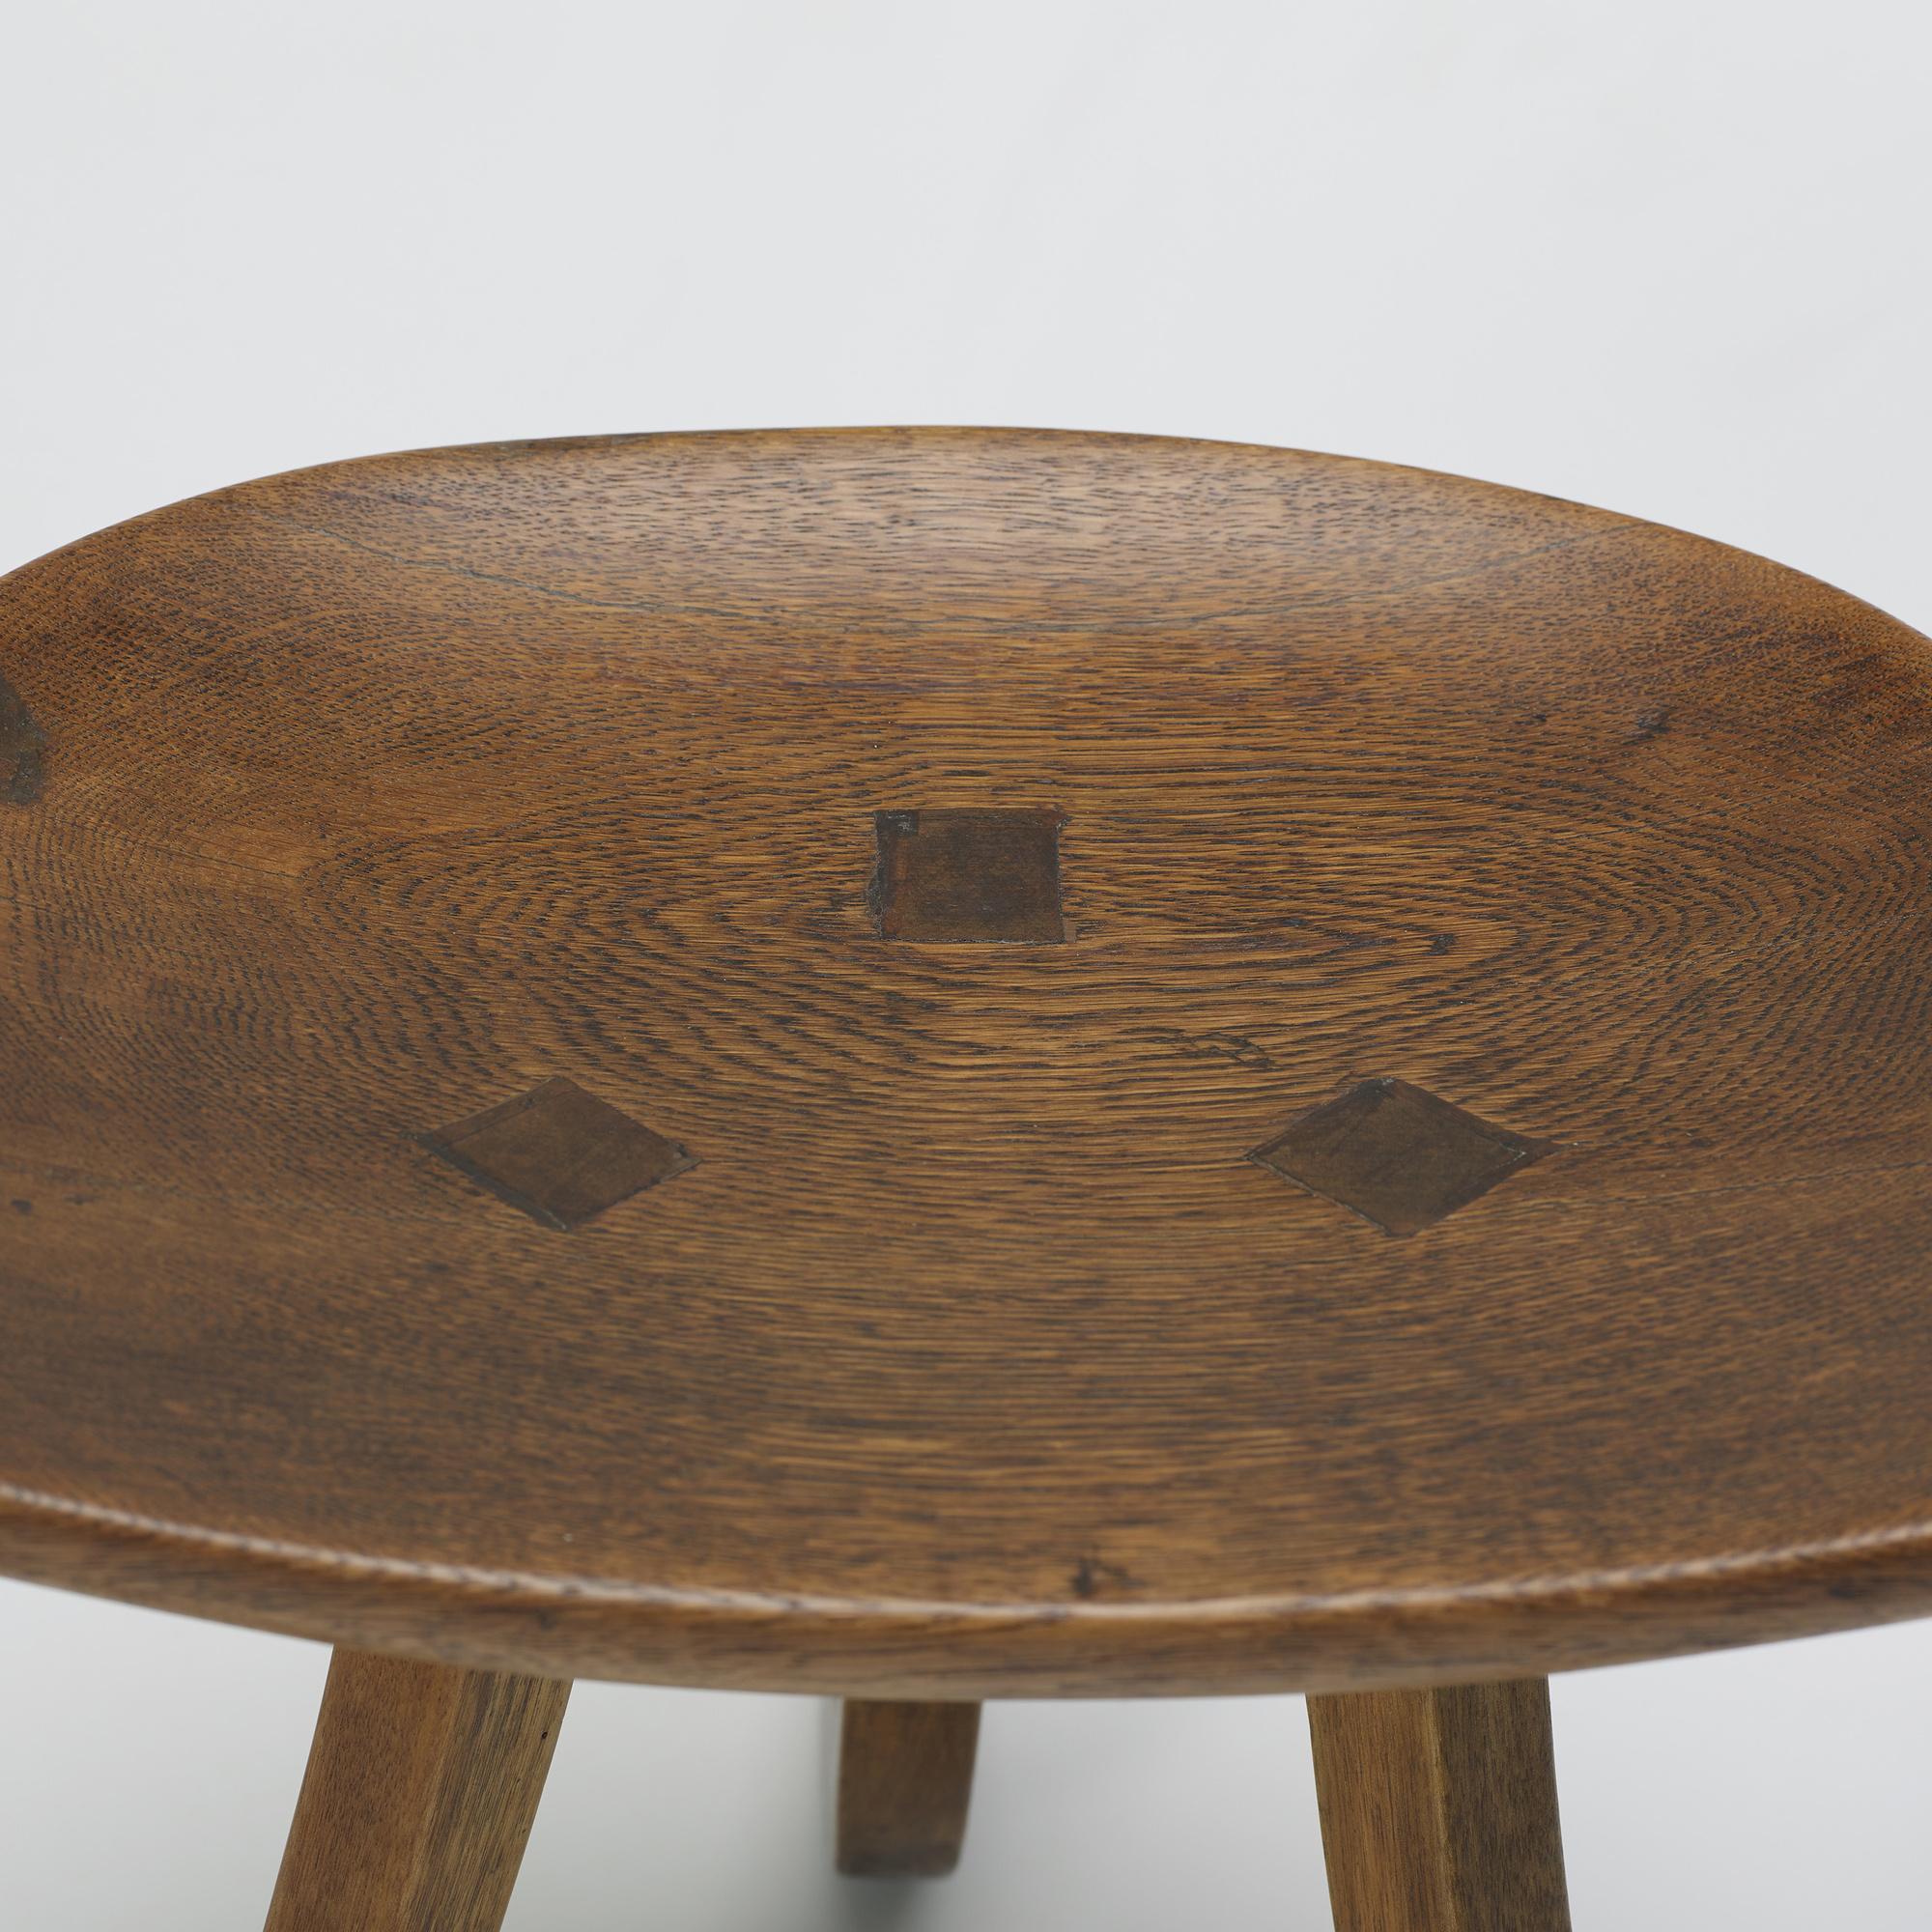 489 adolf loos stool for Designburo loos